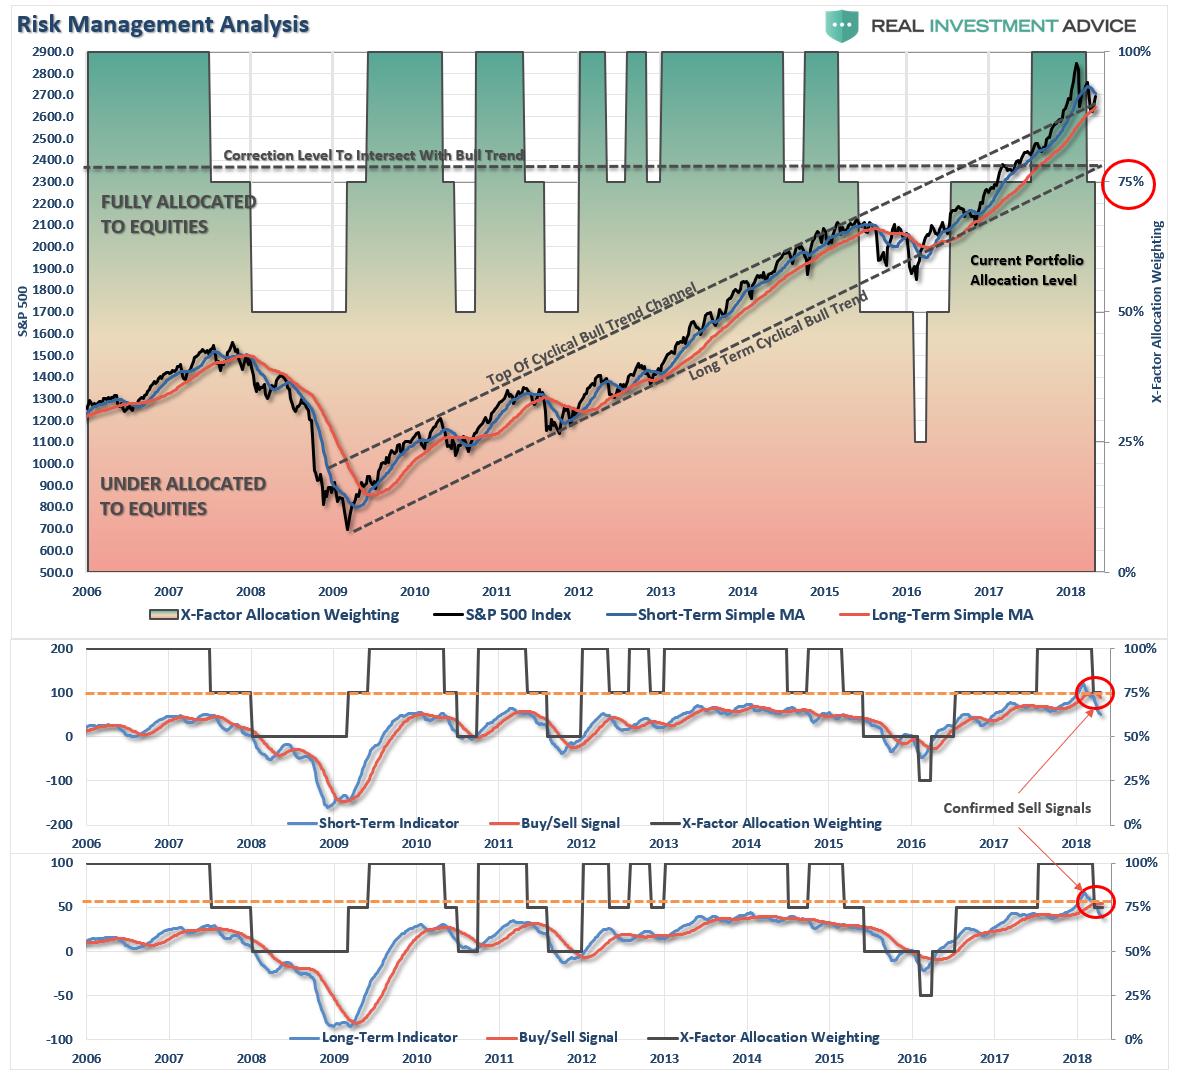 Risk Management Analysis